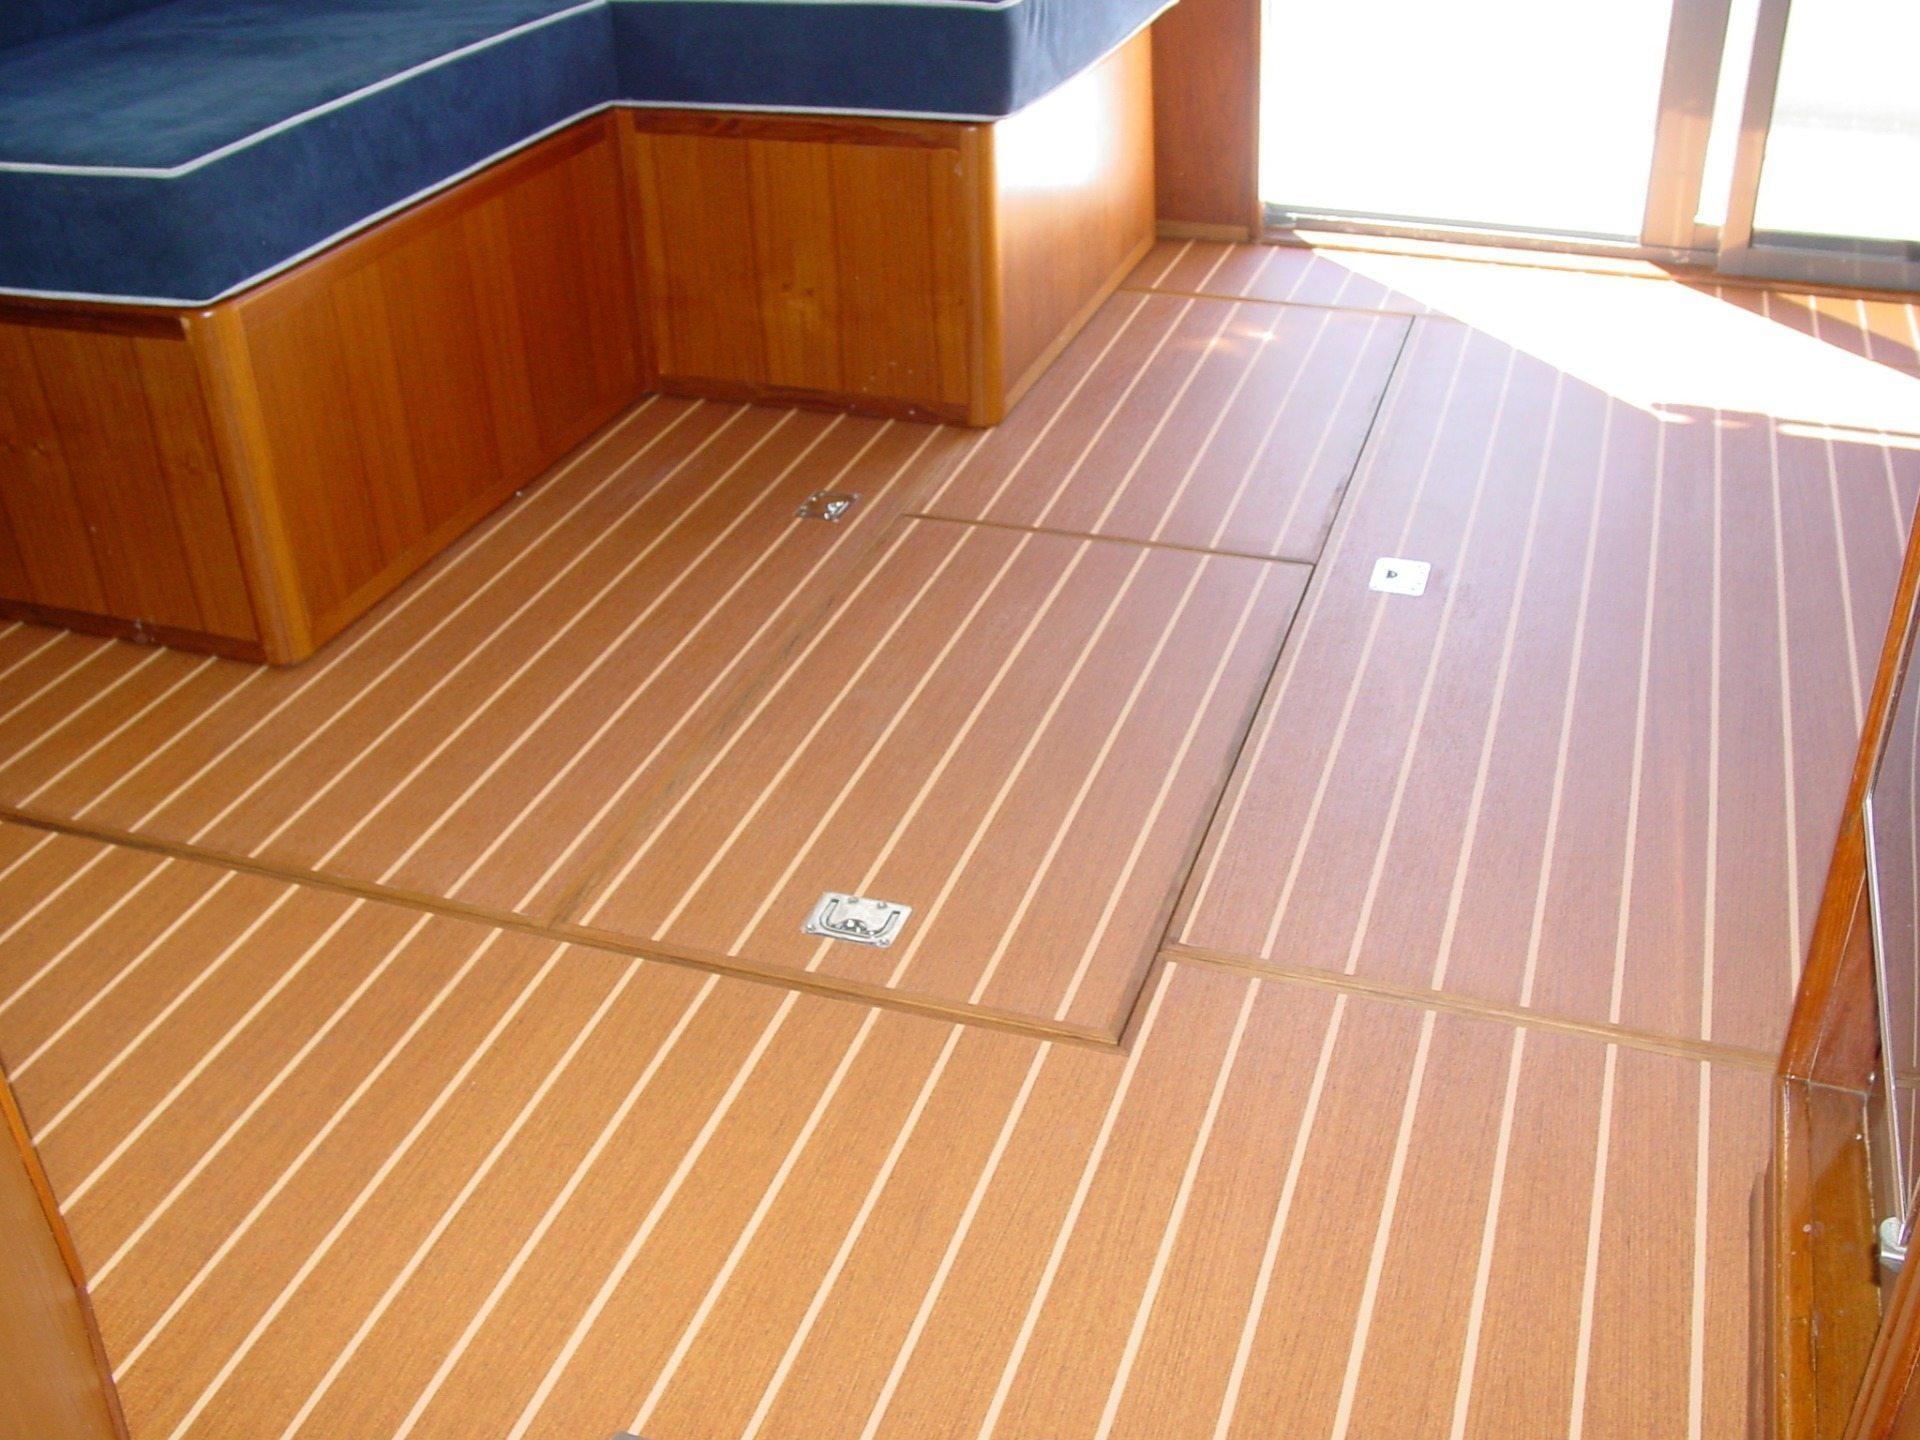 New Product From Plasteak Marine Teak Holly Boat Interior Flooring Teak Decking By Trim Nautica